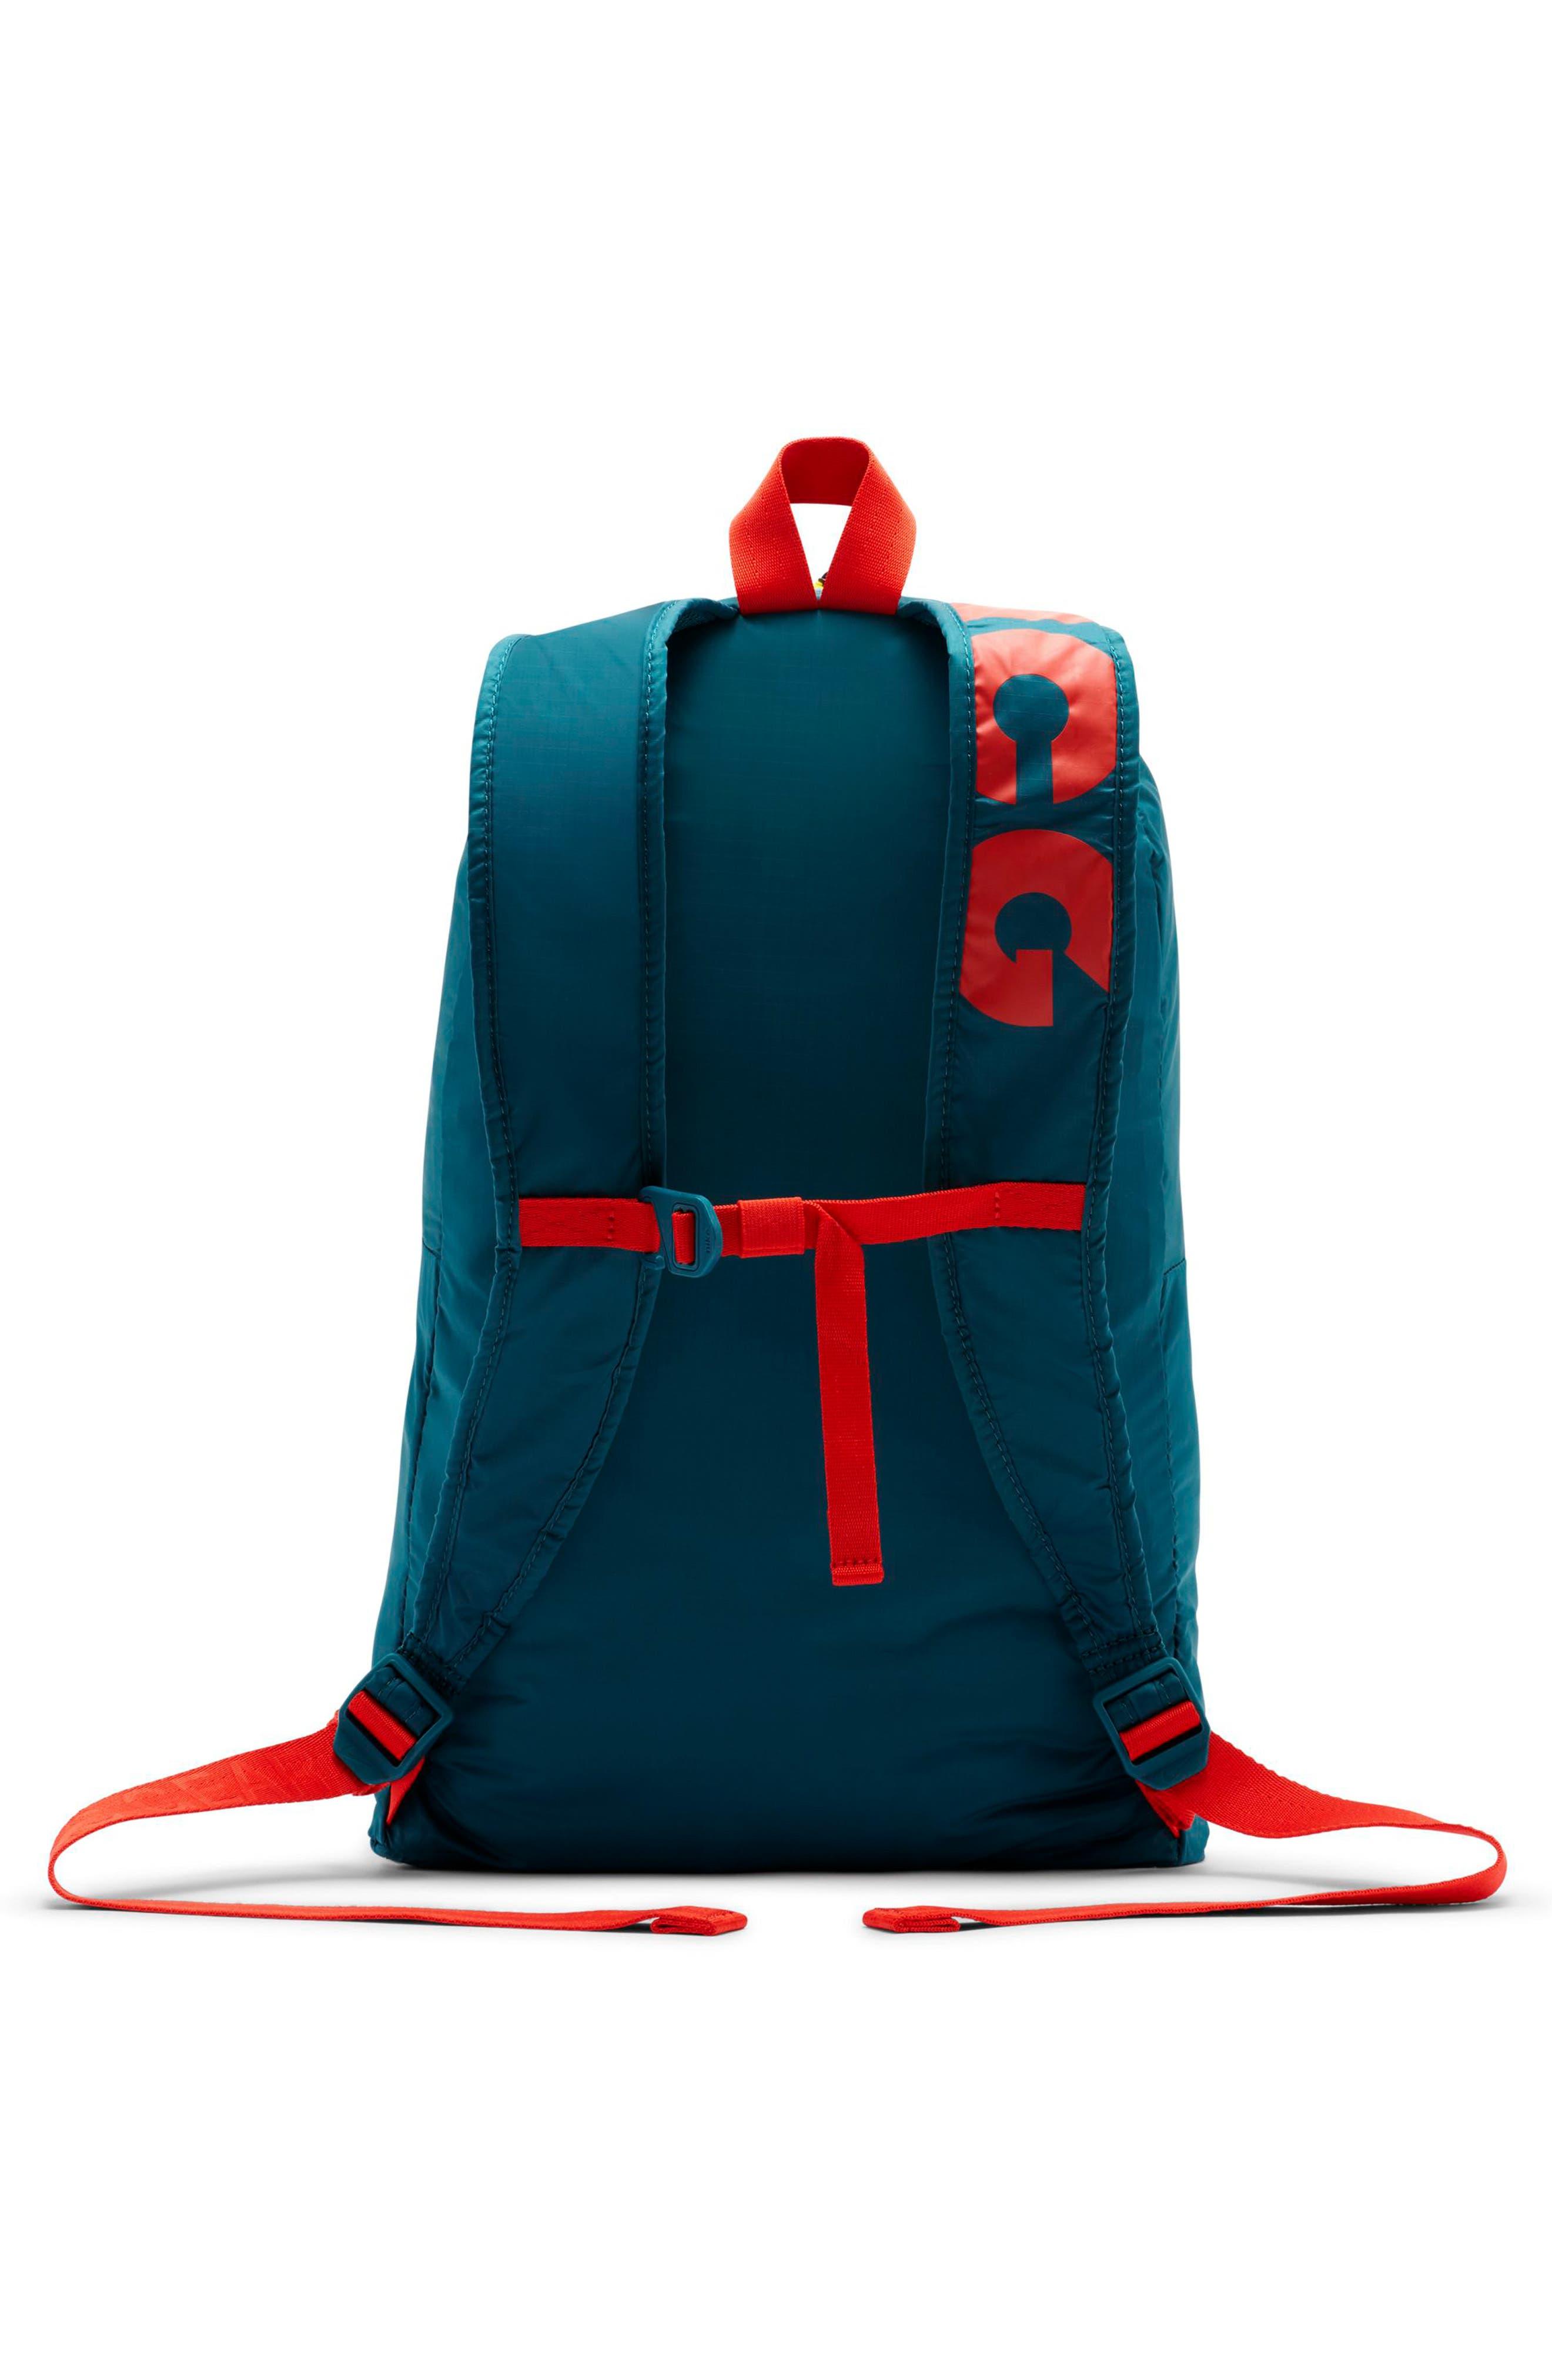 NIKE, ACG Packable Backpack, Alternate thumbnail 2, color, GEODE TEAL/ GEODE TEAL